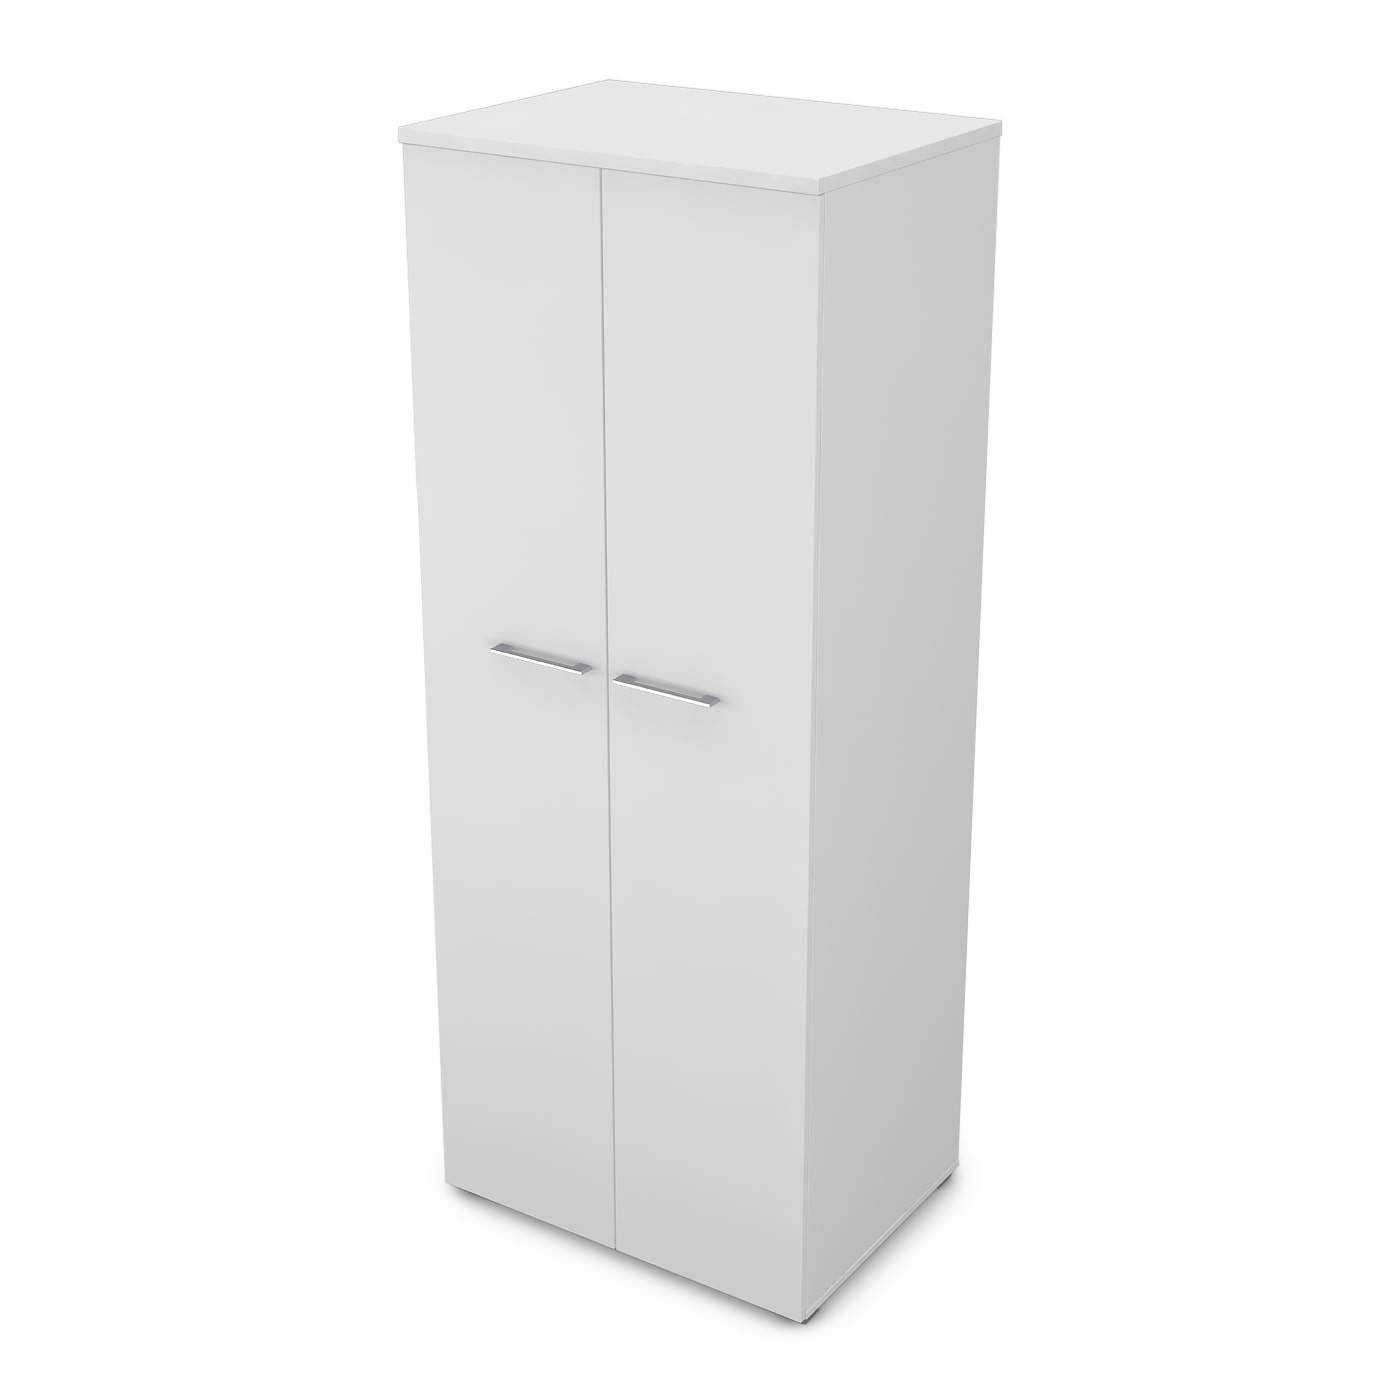 Шкаф для одежды 800x450x2045